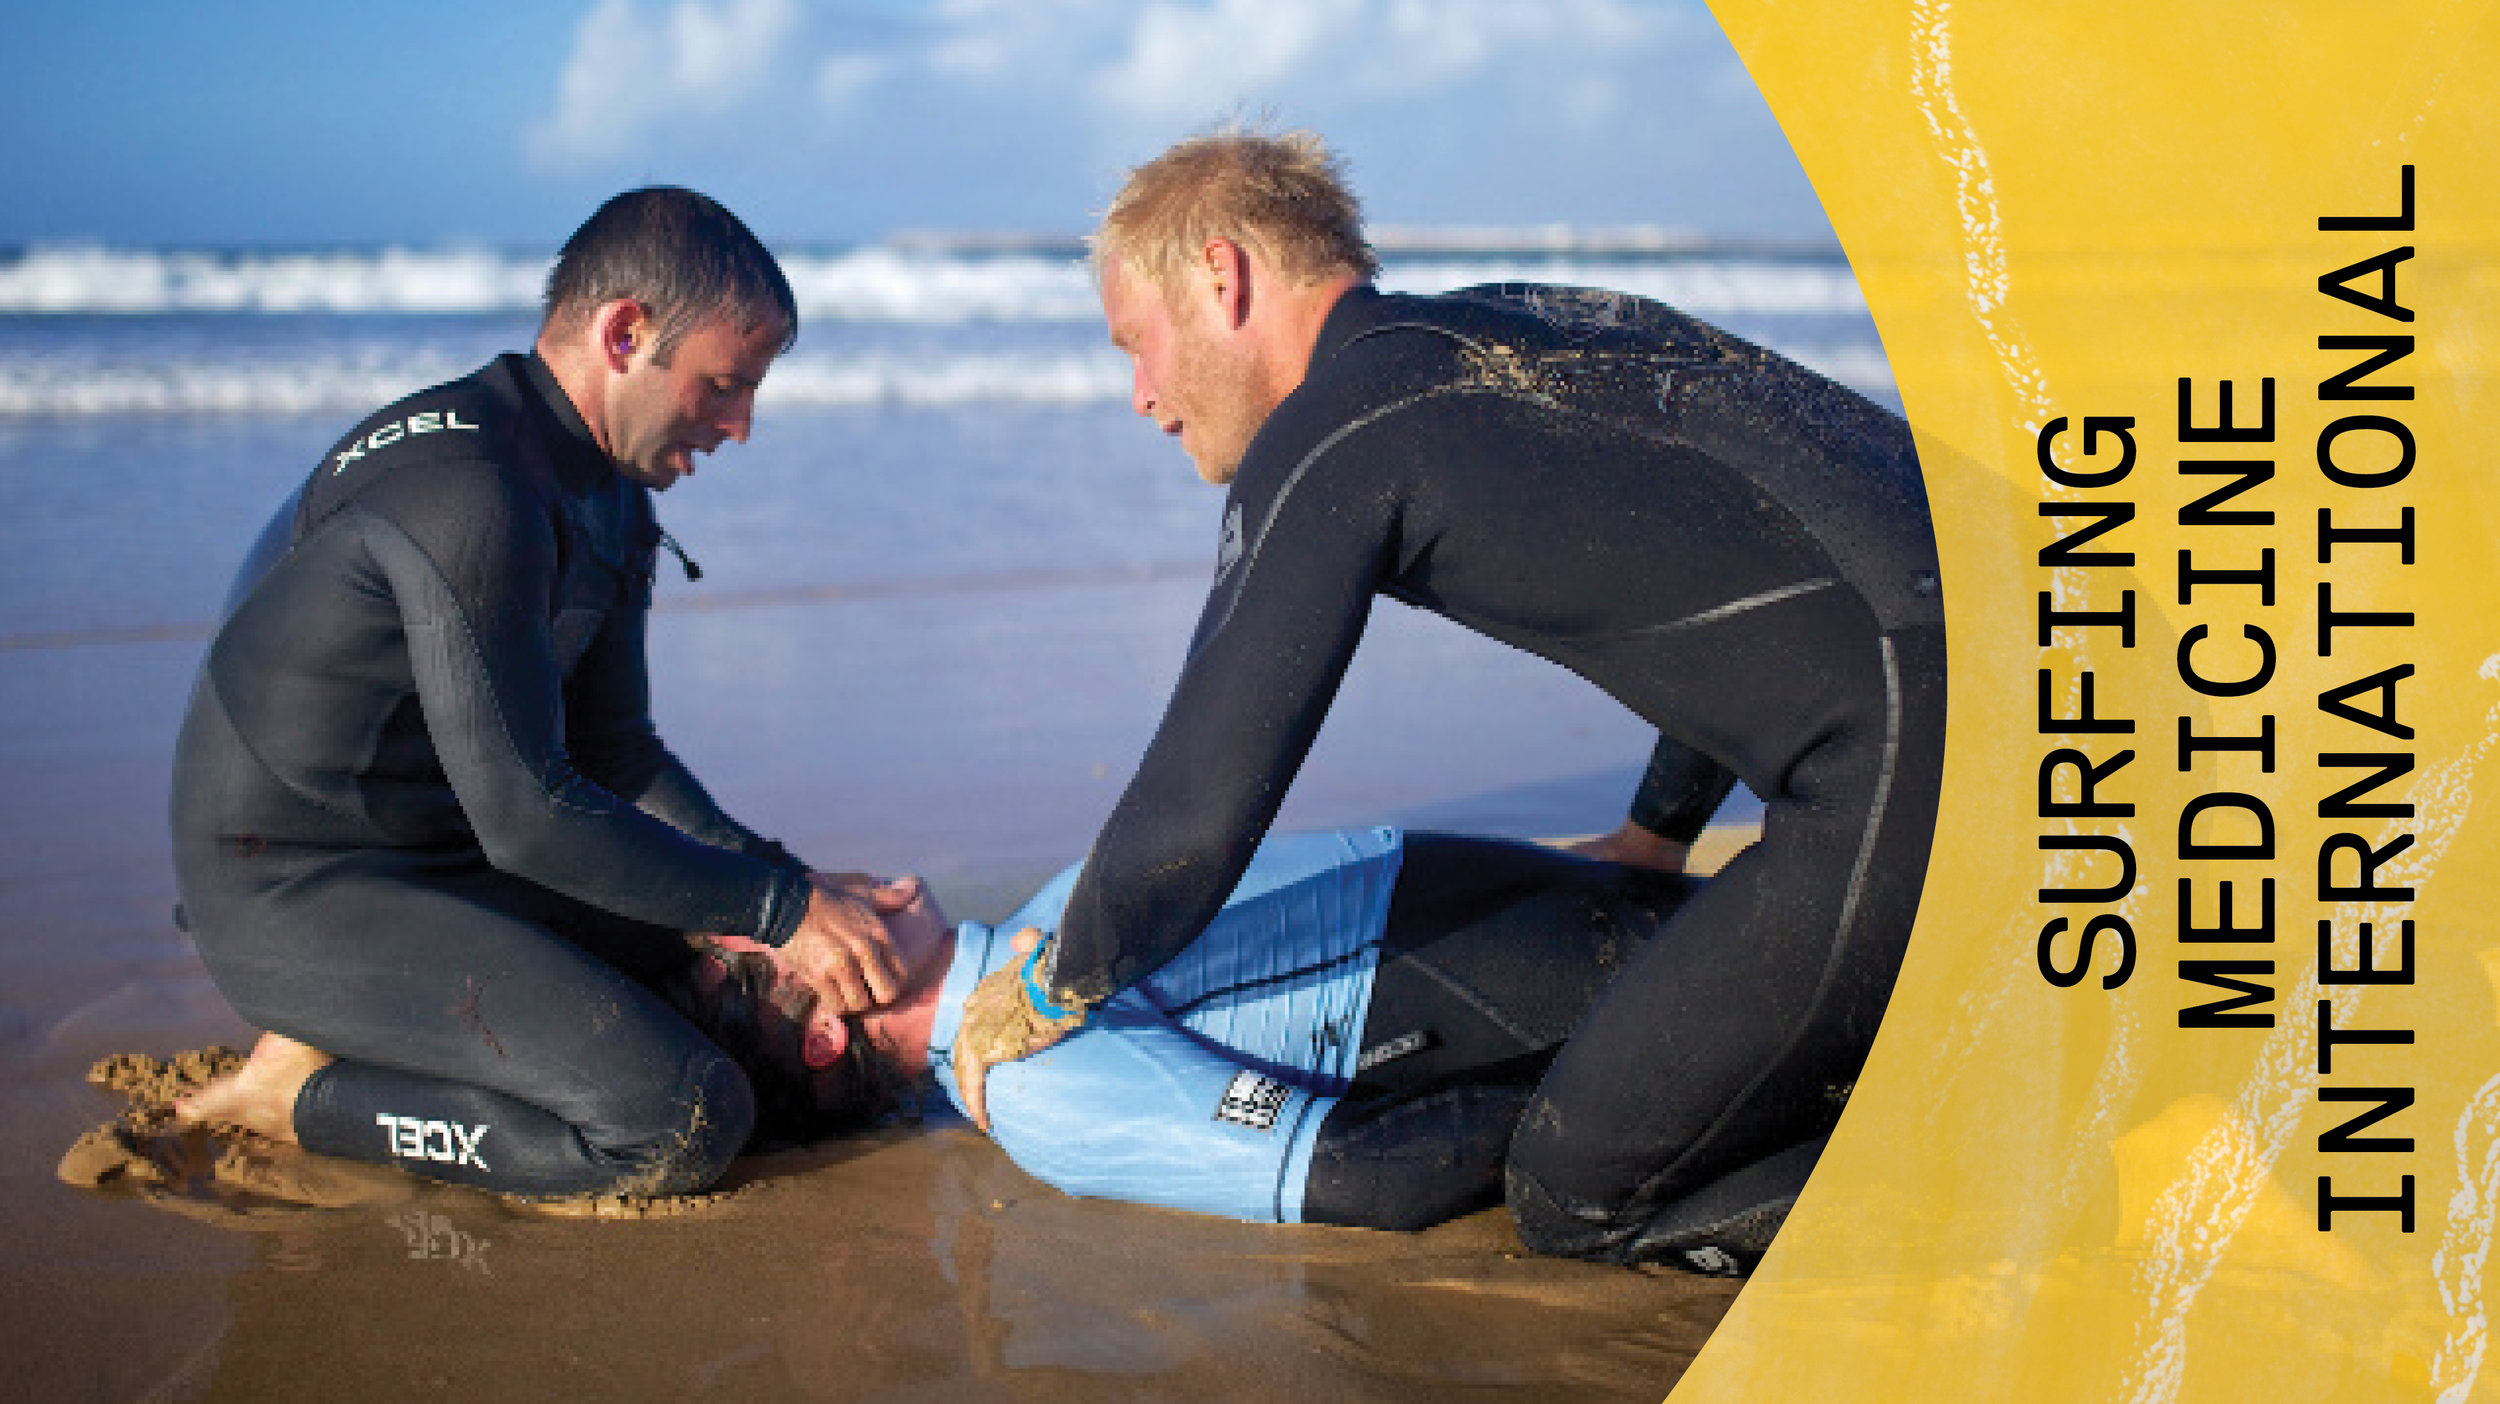 I AM SURF Film Festival-Workshop Surfing Medicine International.jpg